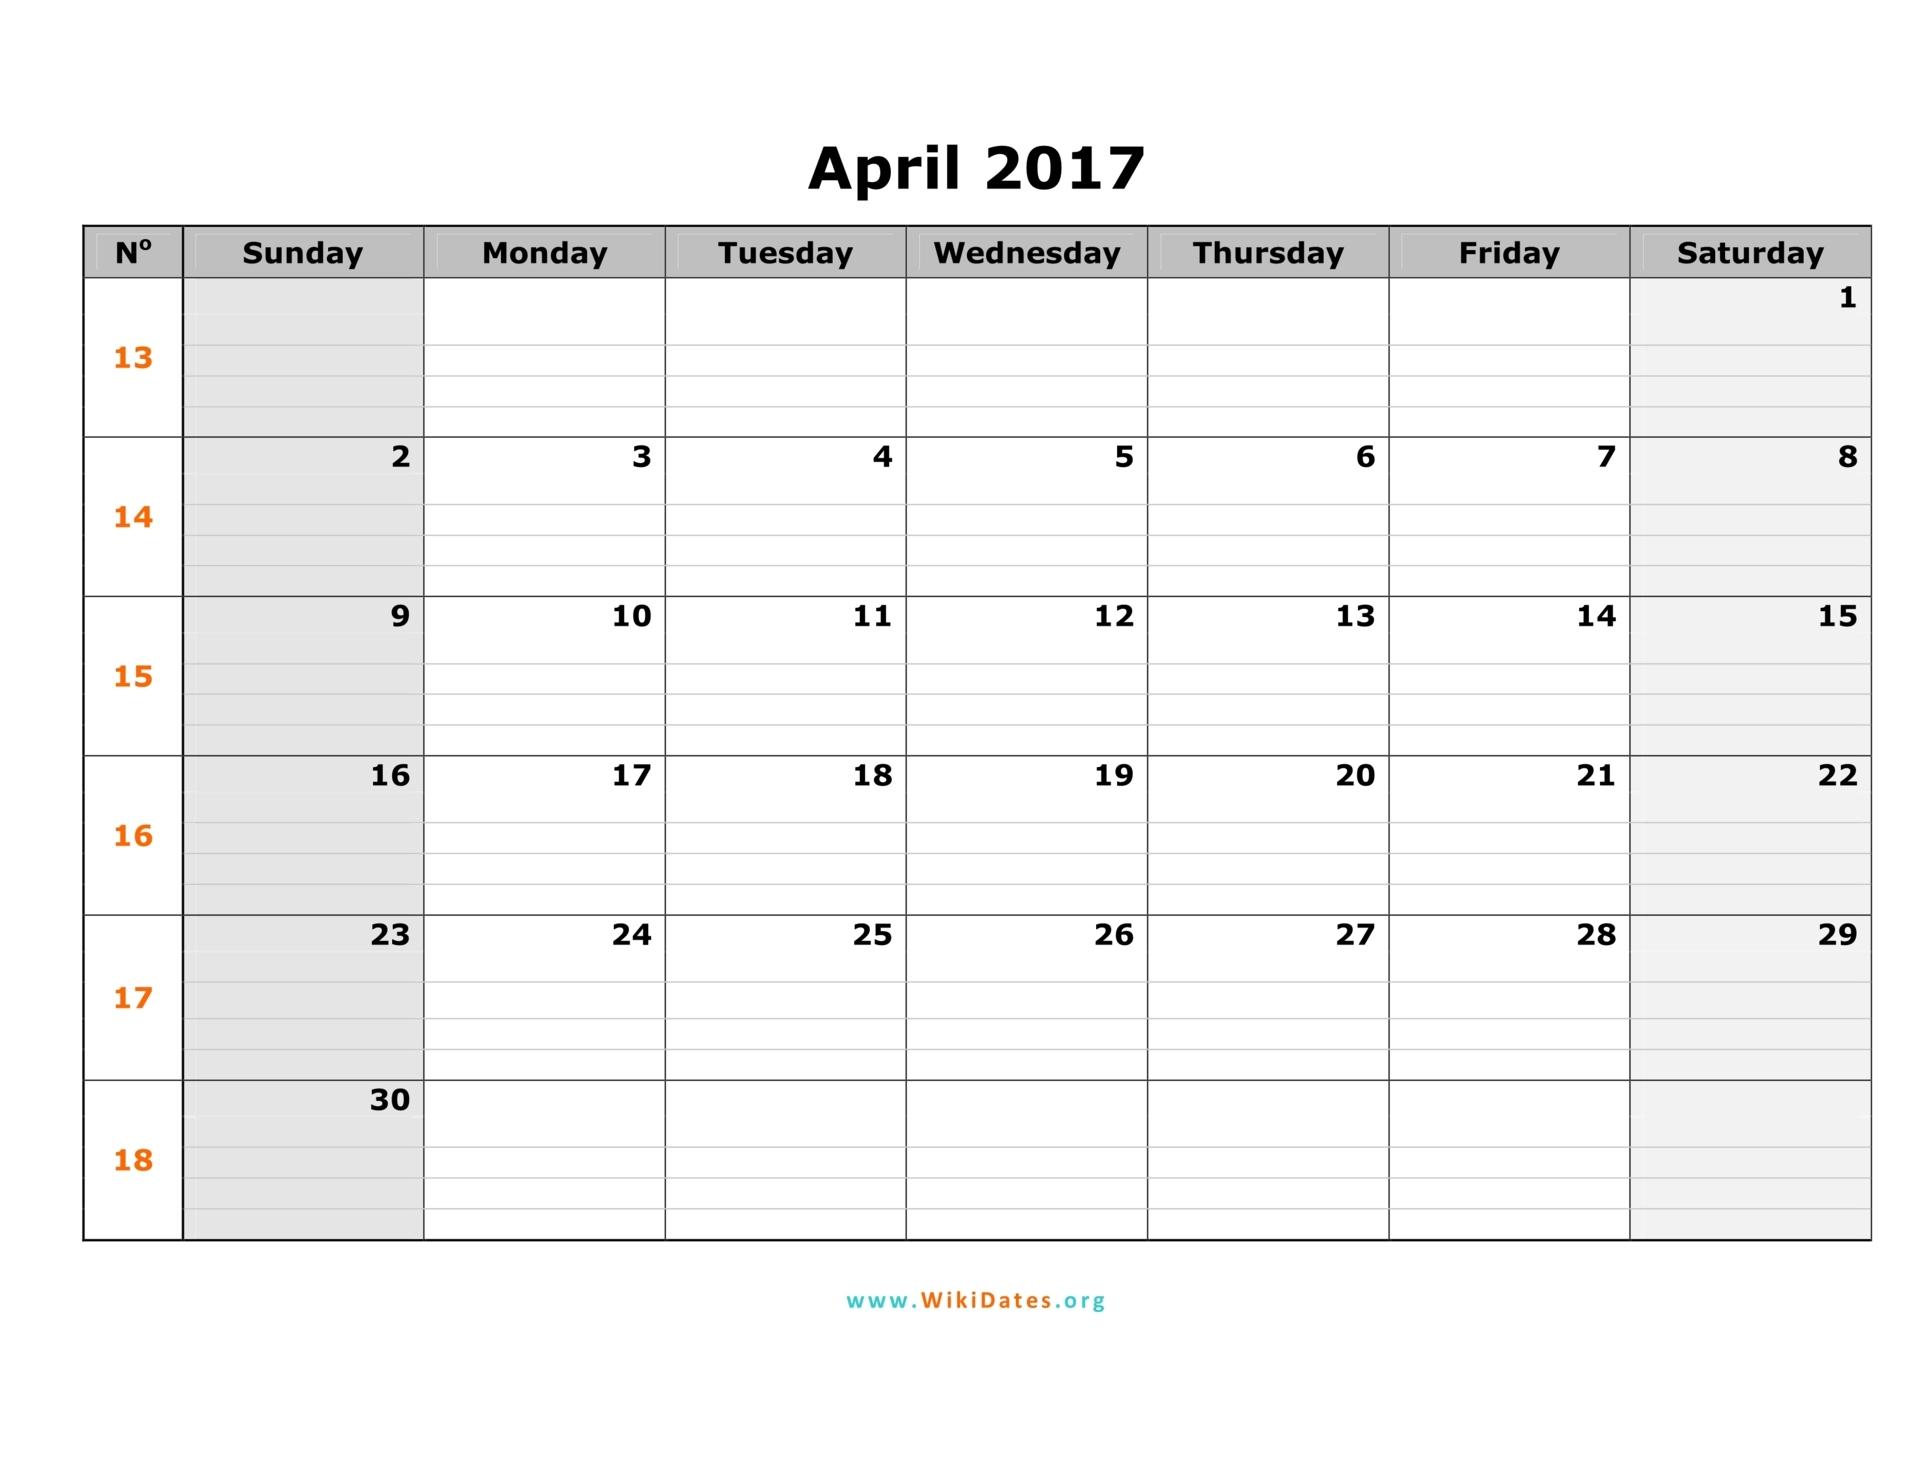 April 2017 Calendar | WikiDates.org